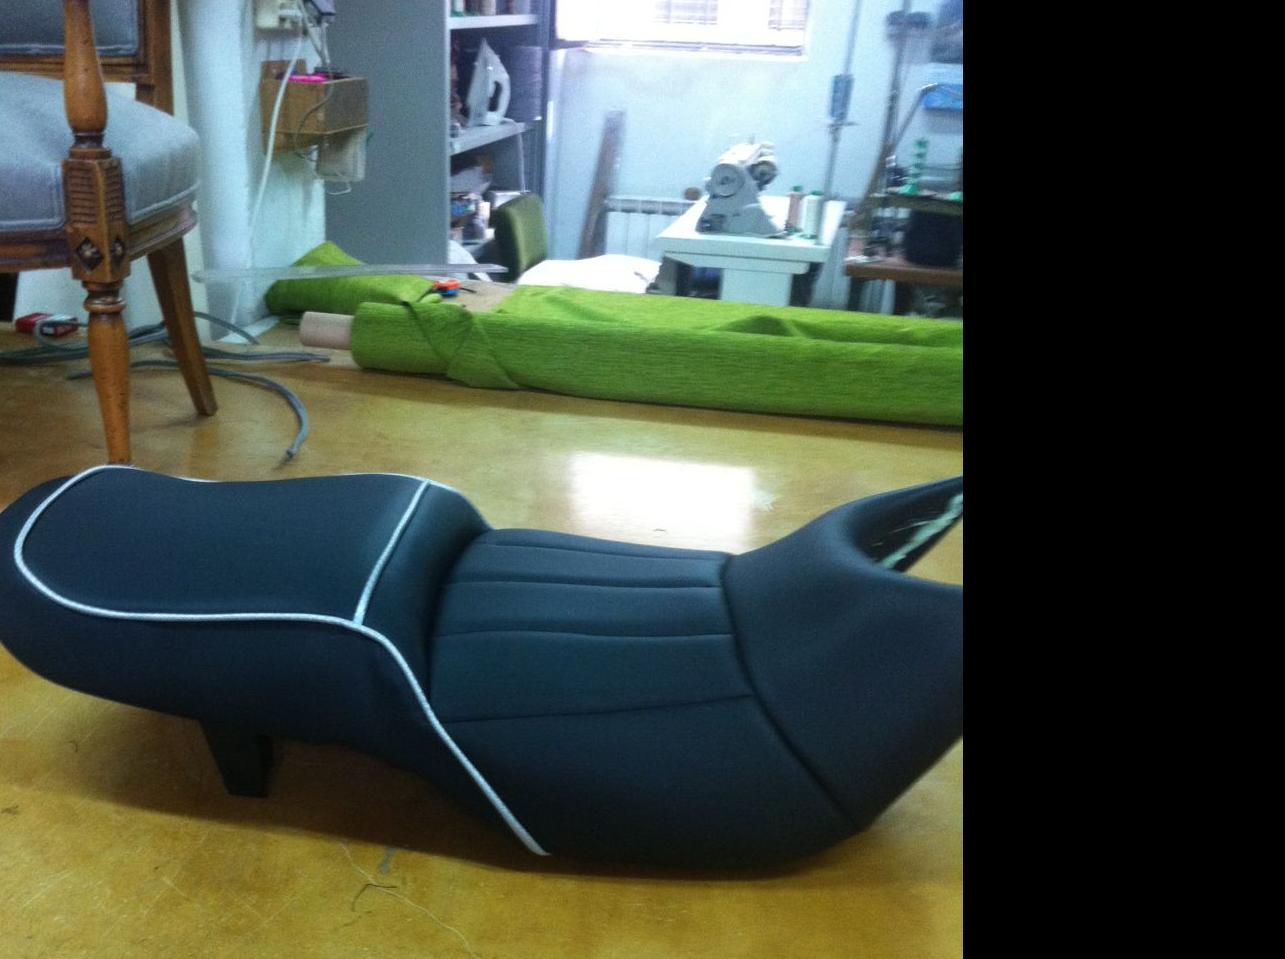 Tapizado de asientos de motos productos de c rdoba tapizados - Tapicerias en cordoba ...